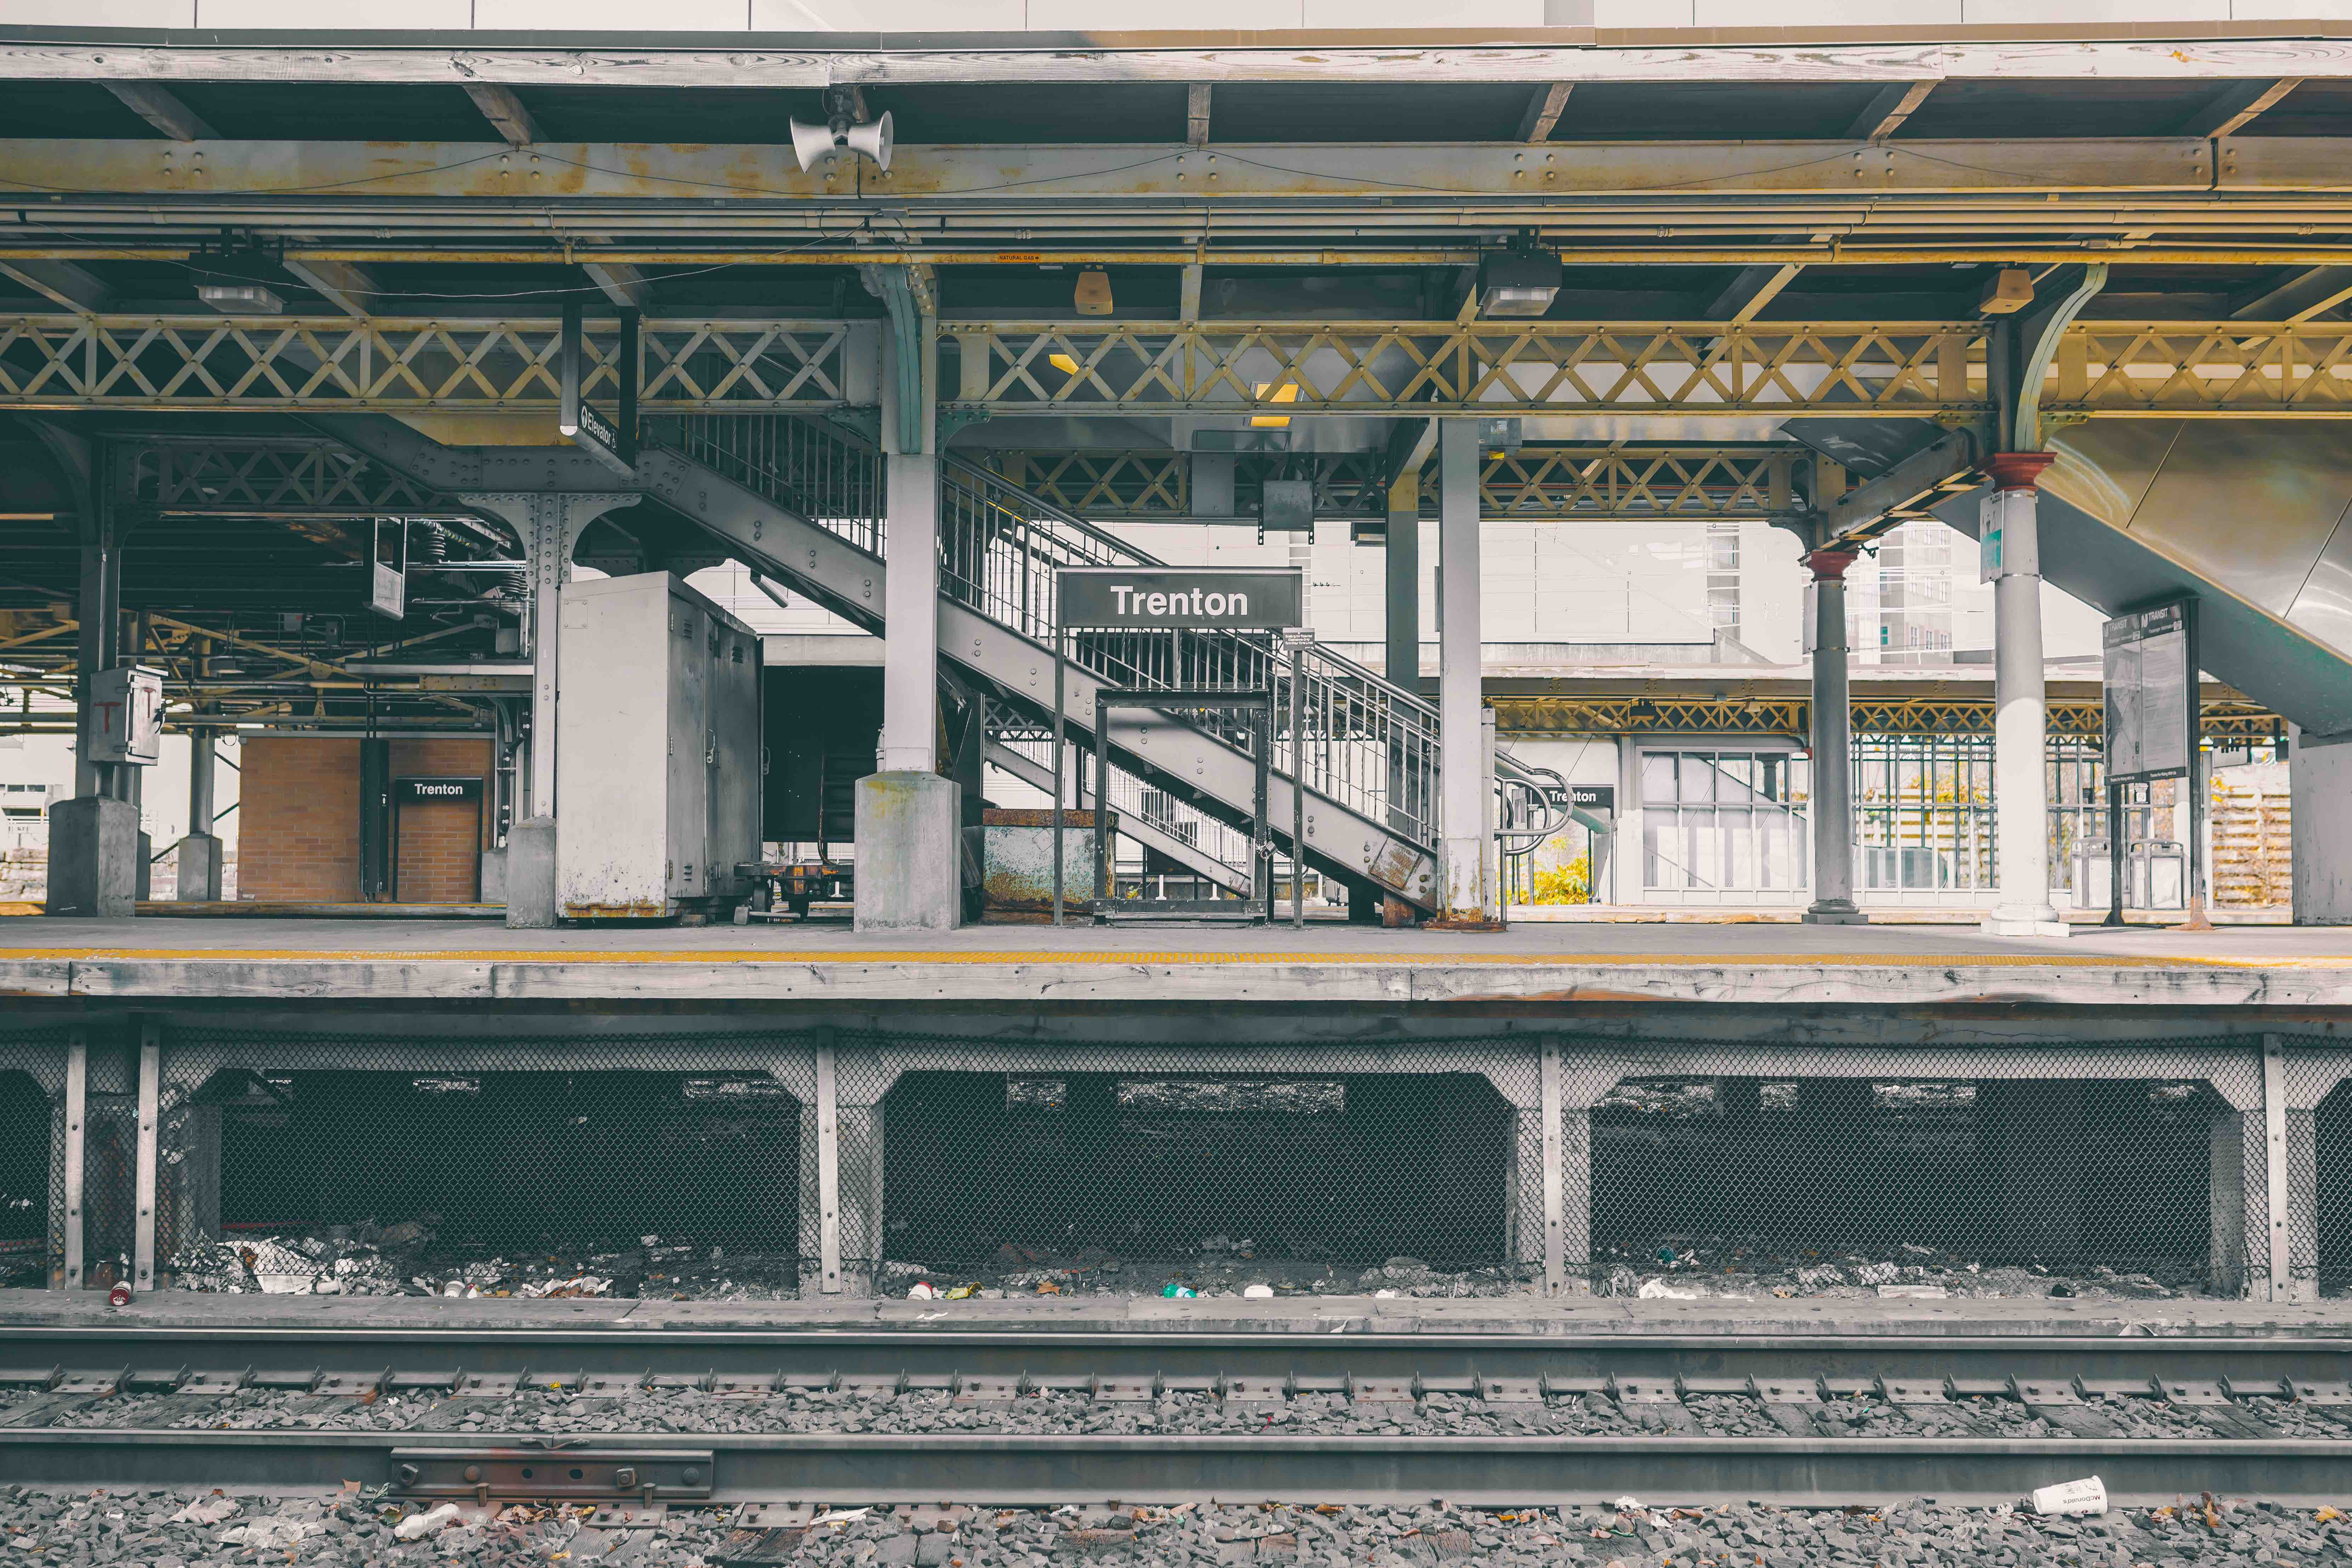 Trenton Train Station